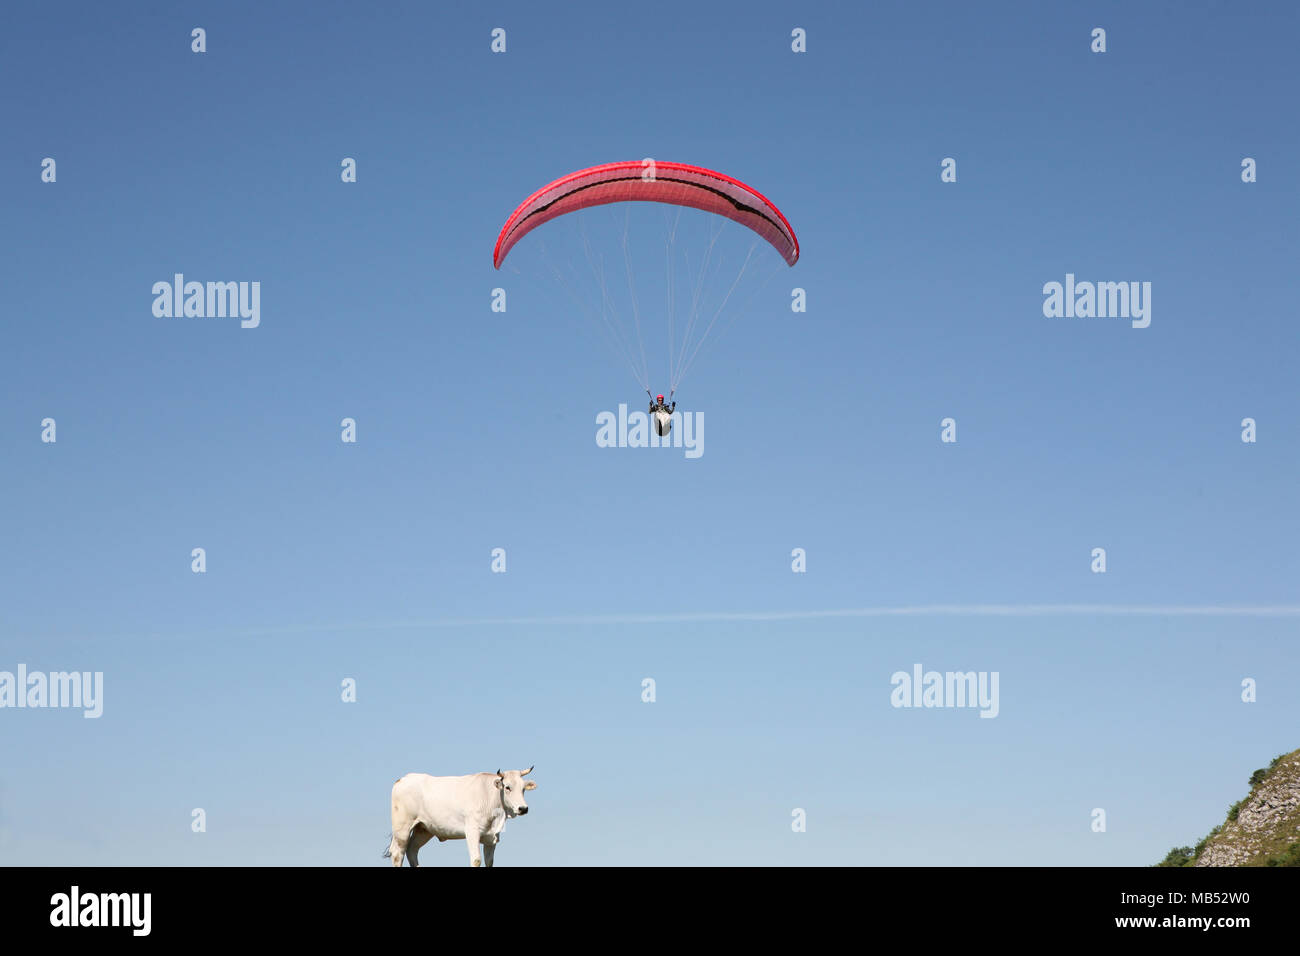 Hang glider and bovine - Stock Image